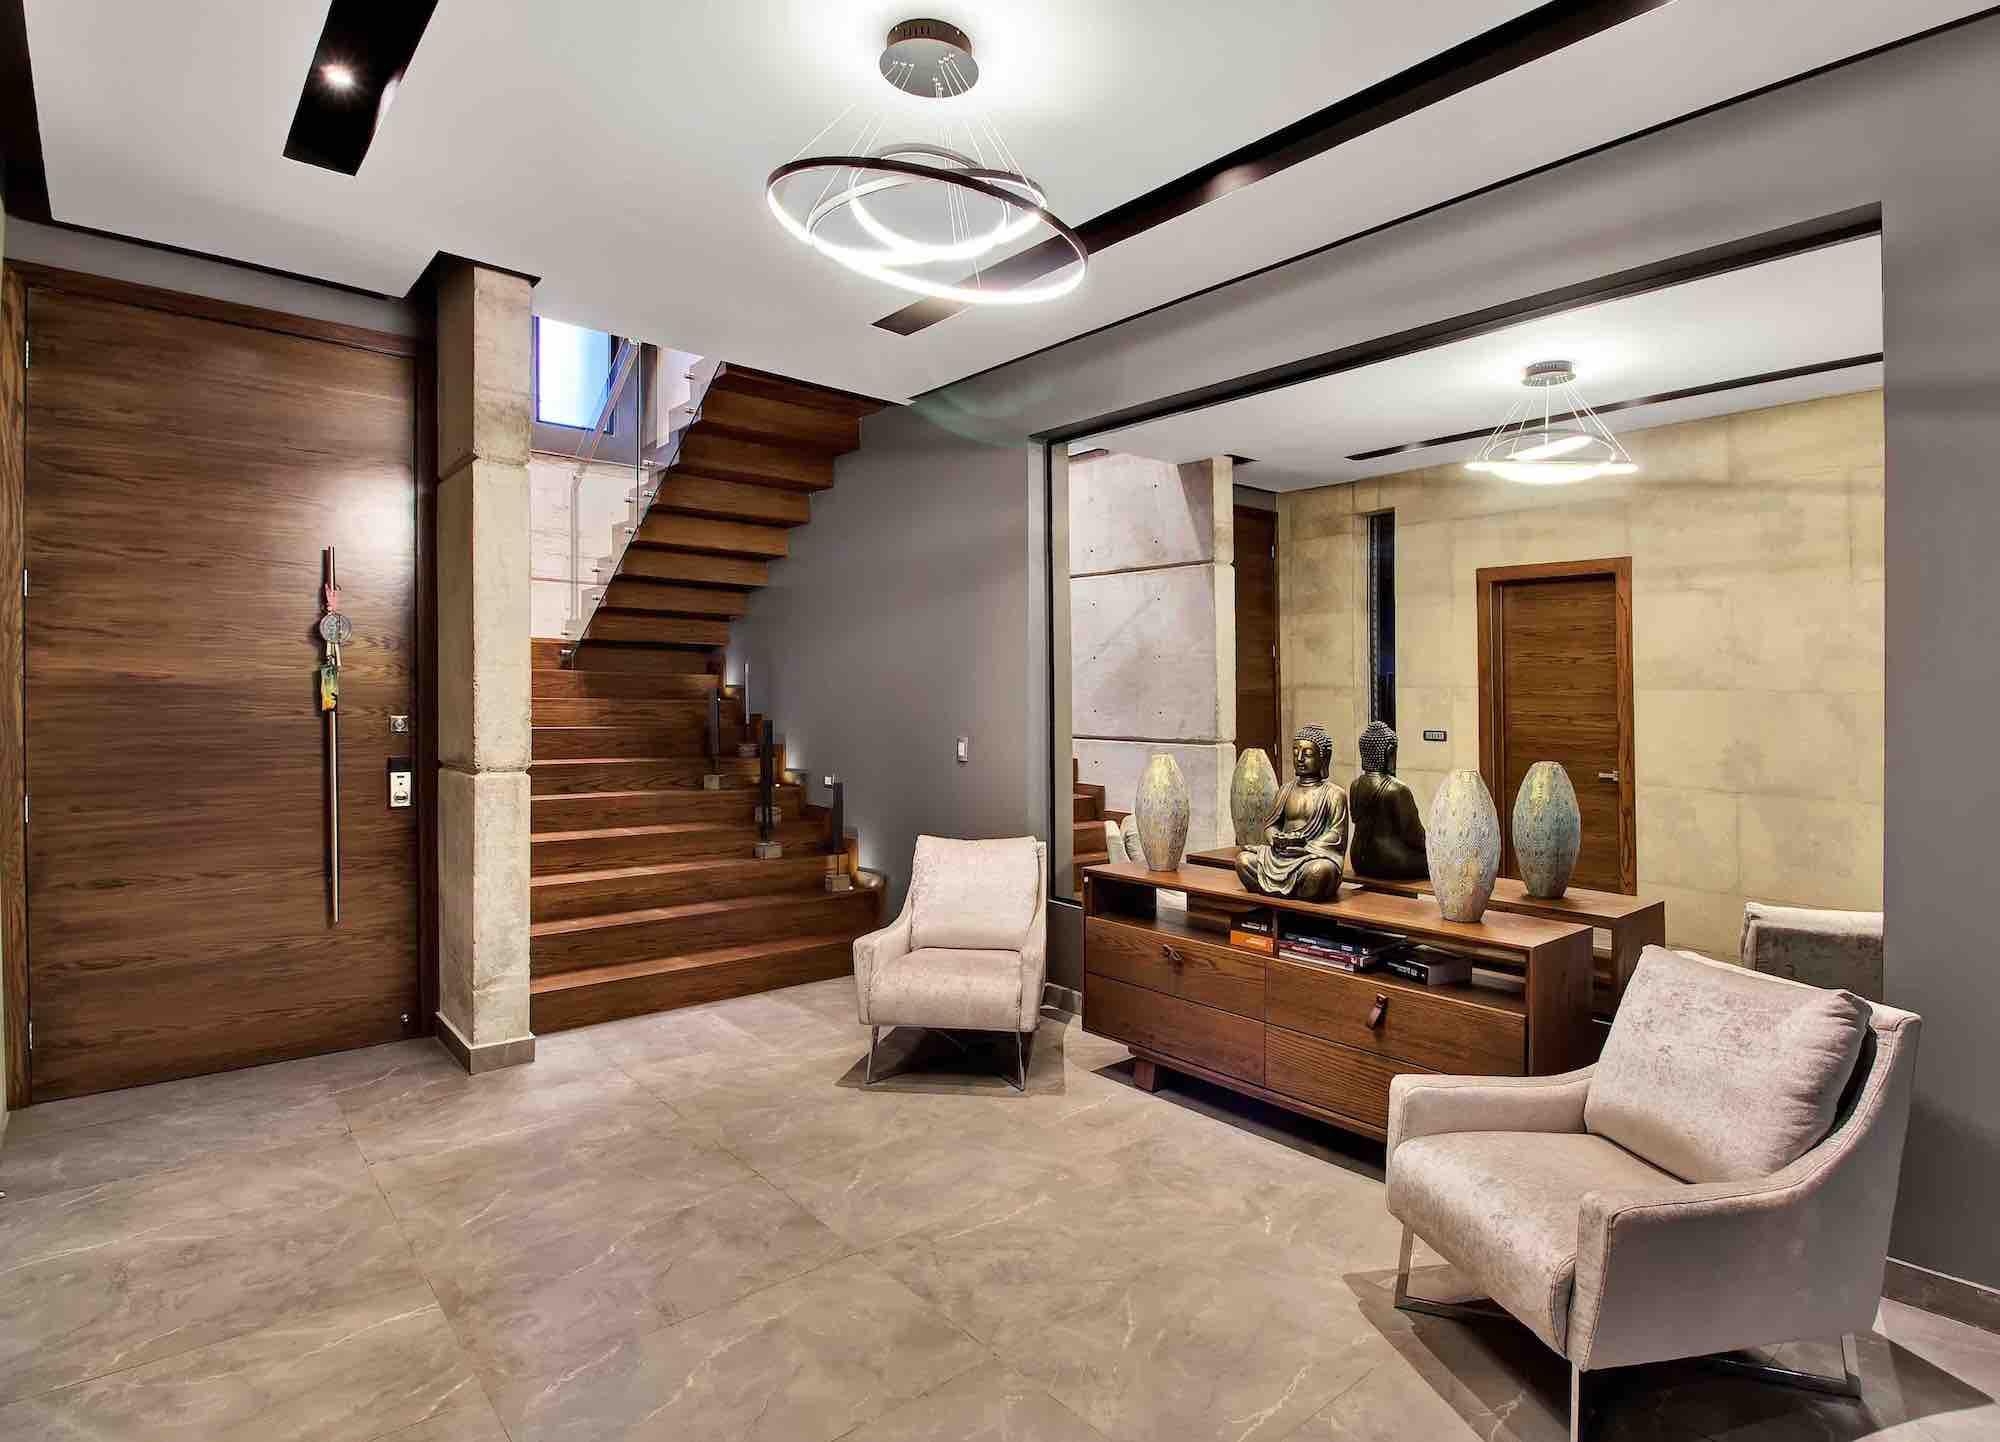 GR_House_Gallardo_arquitectura_amazingarchitecture_mexico_010.jpg